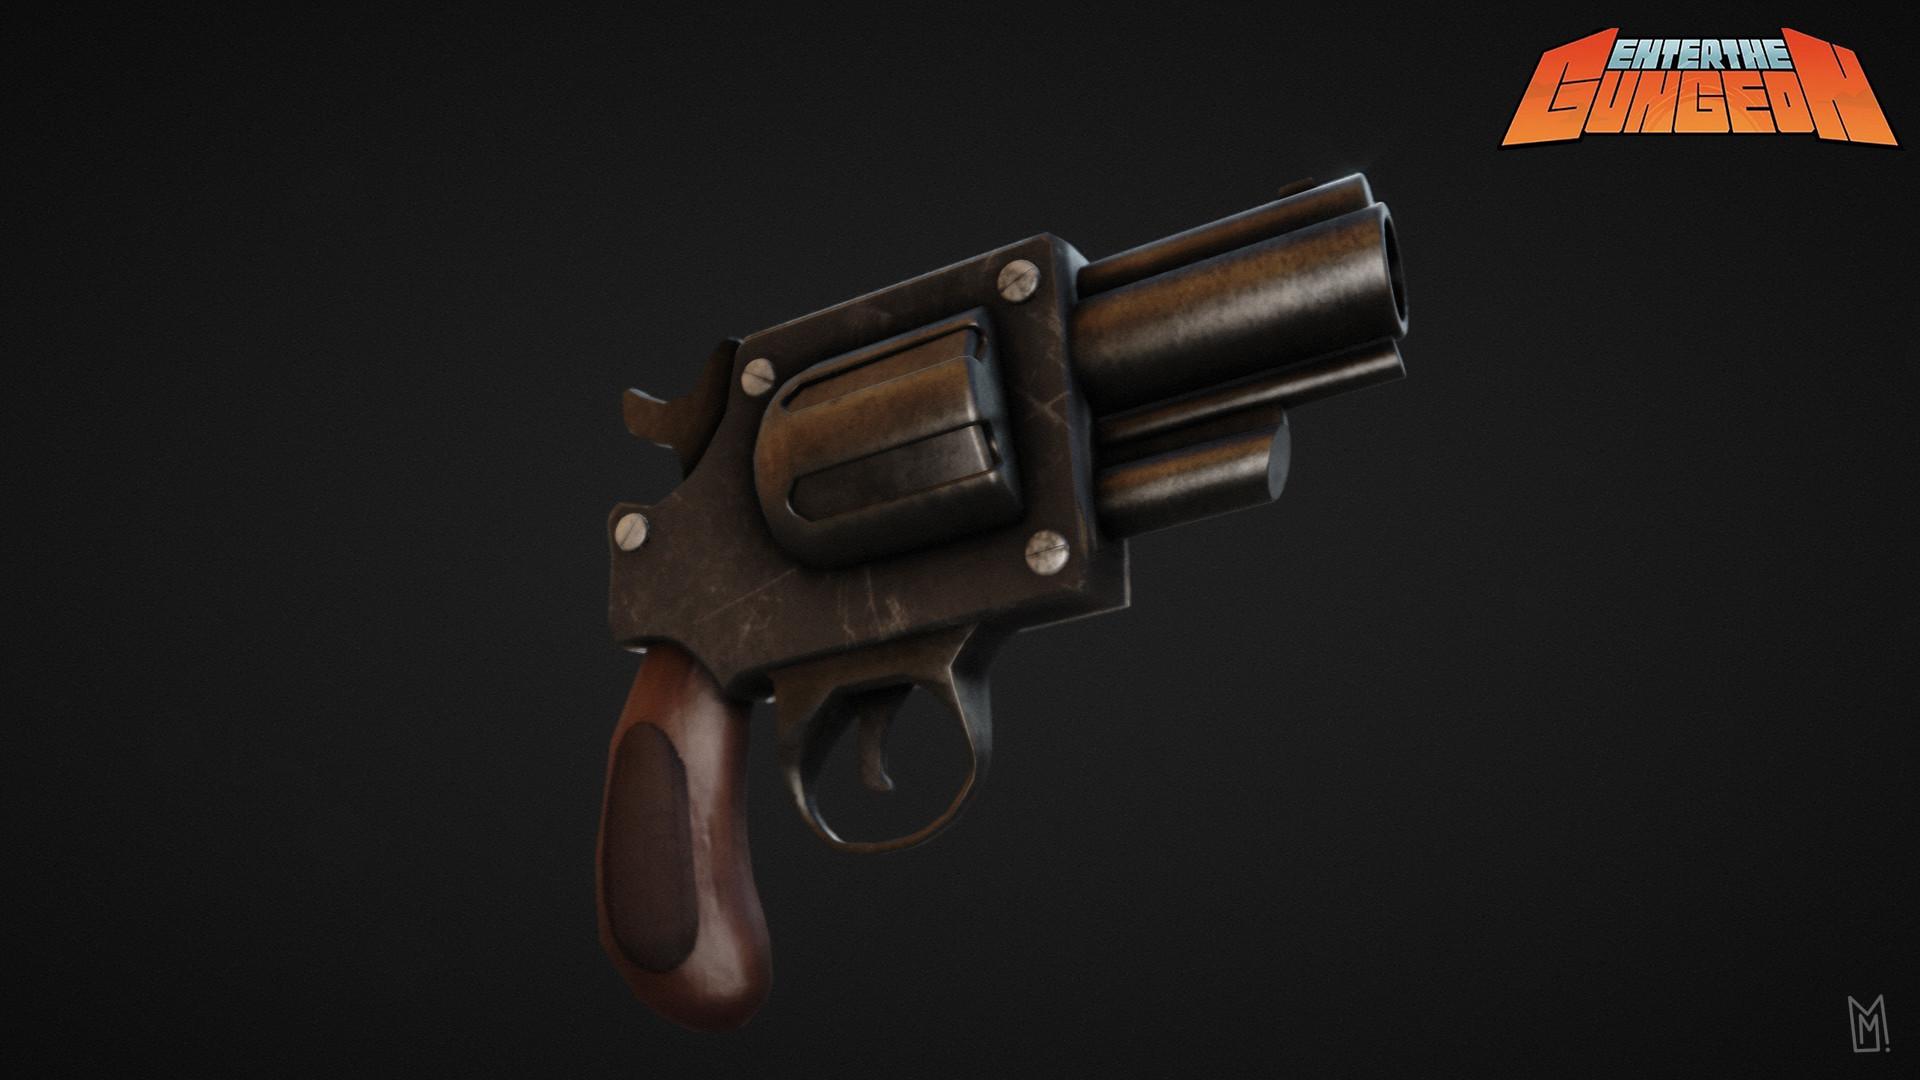 ArtStation - Enter the gungeon Gun, Matthieu Mahy